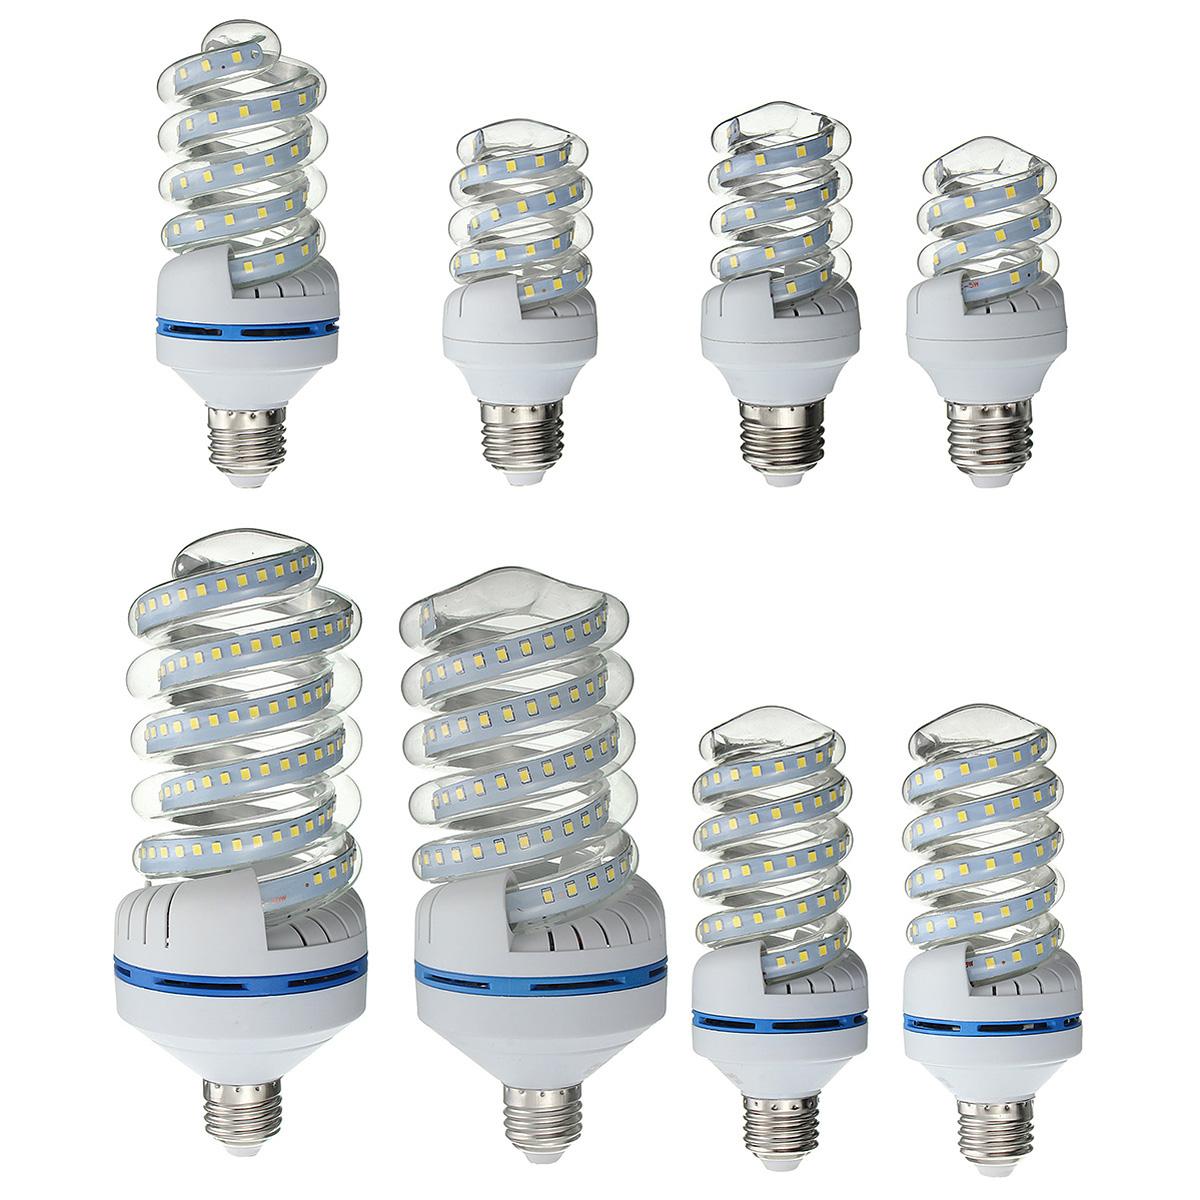 E27 5w 30w Led Spiral Style Ultra Bright Energy Saving